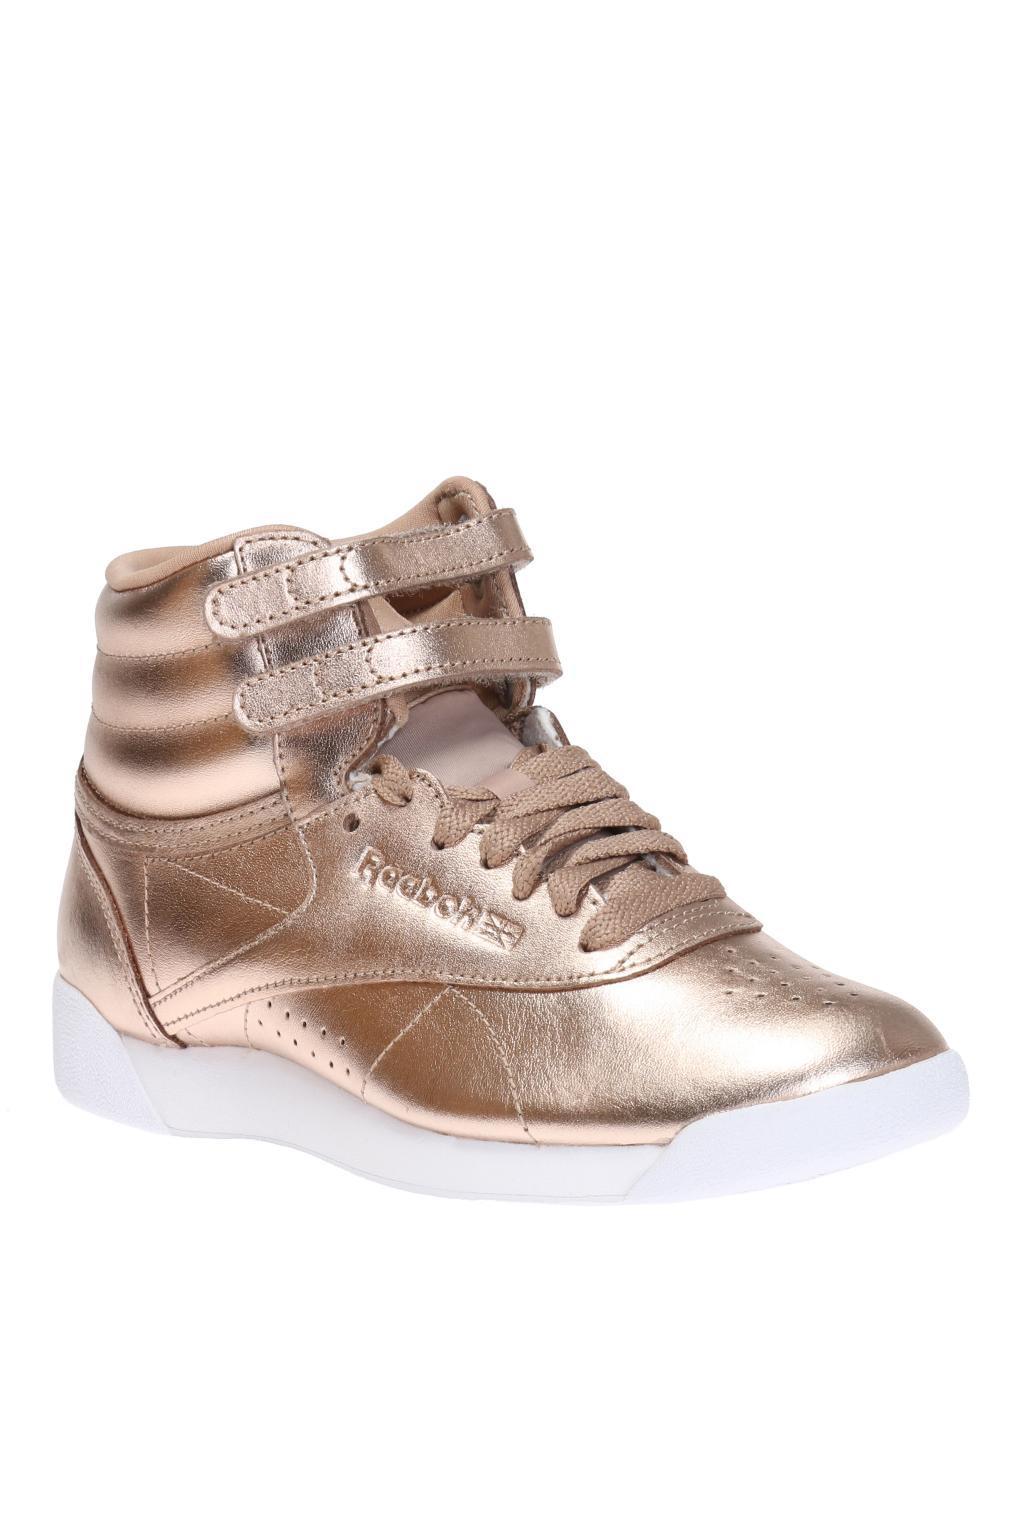 Lyst - Reebok  freestyle Hi Metallic  Sneakers in Pink e22539a500